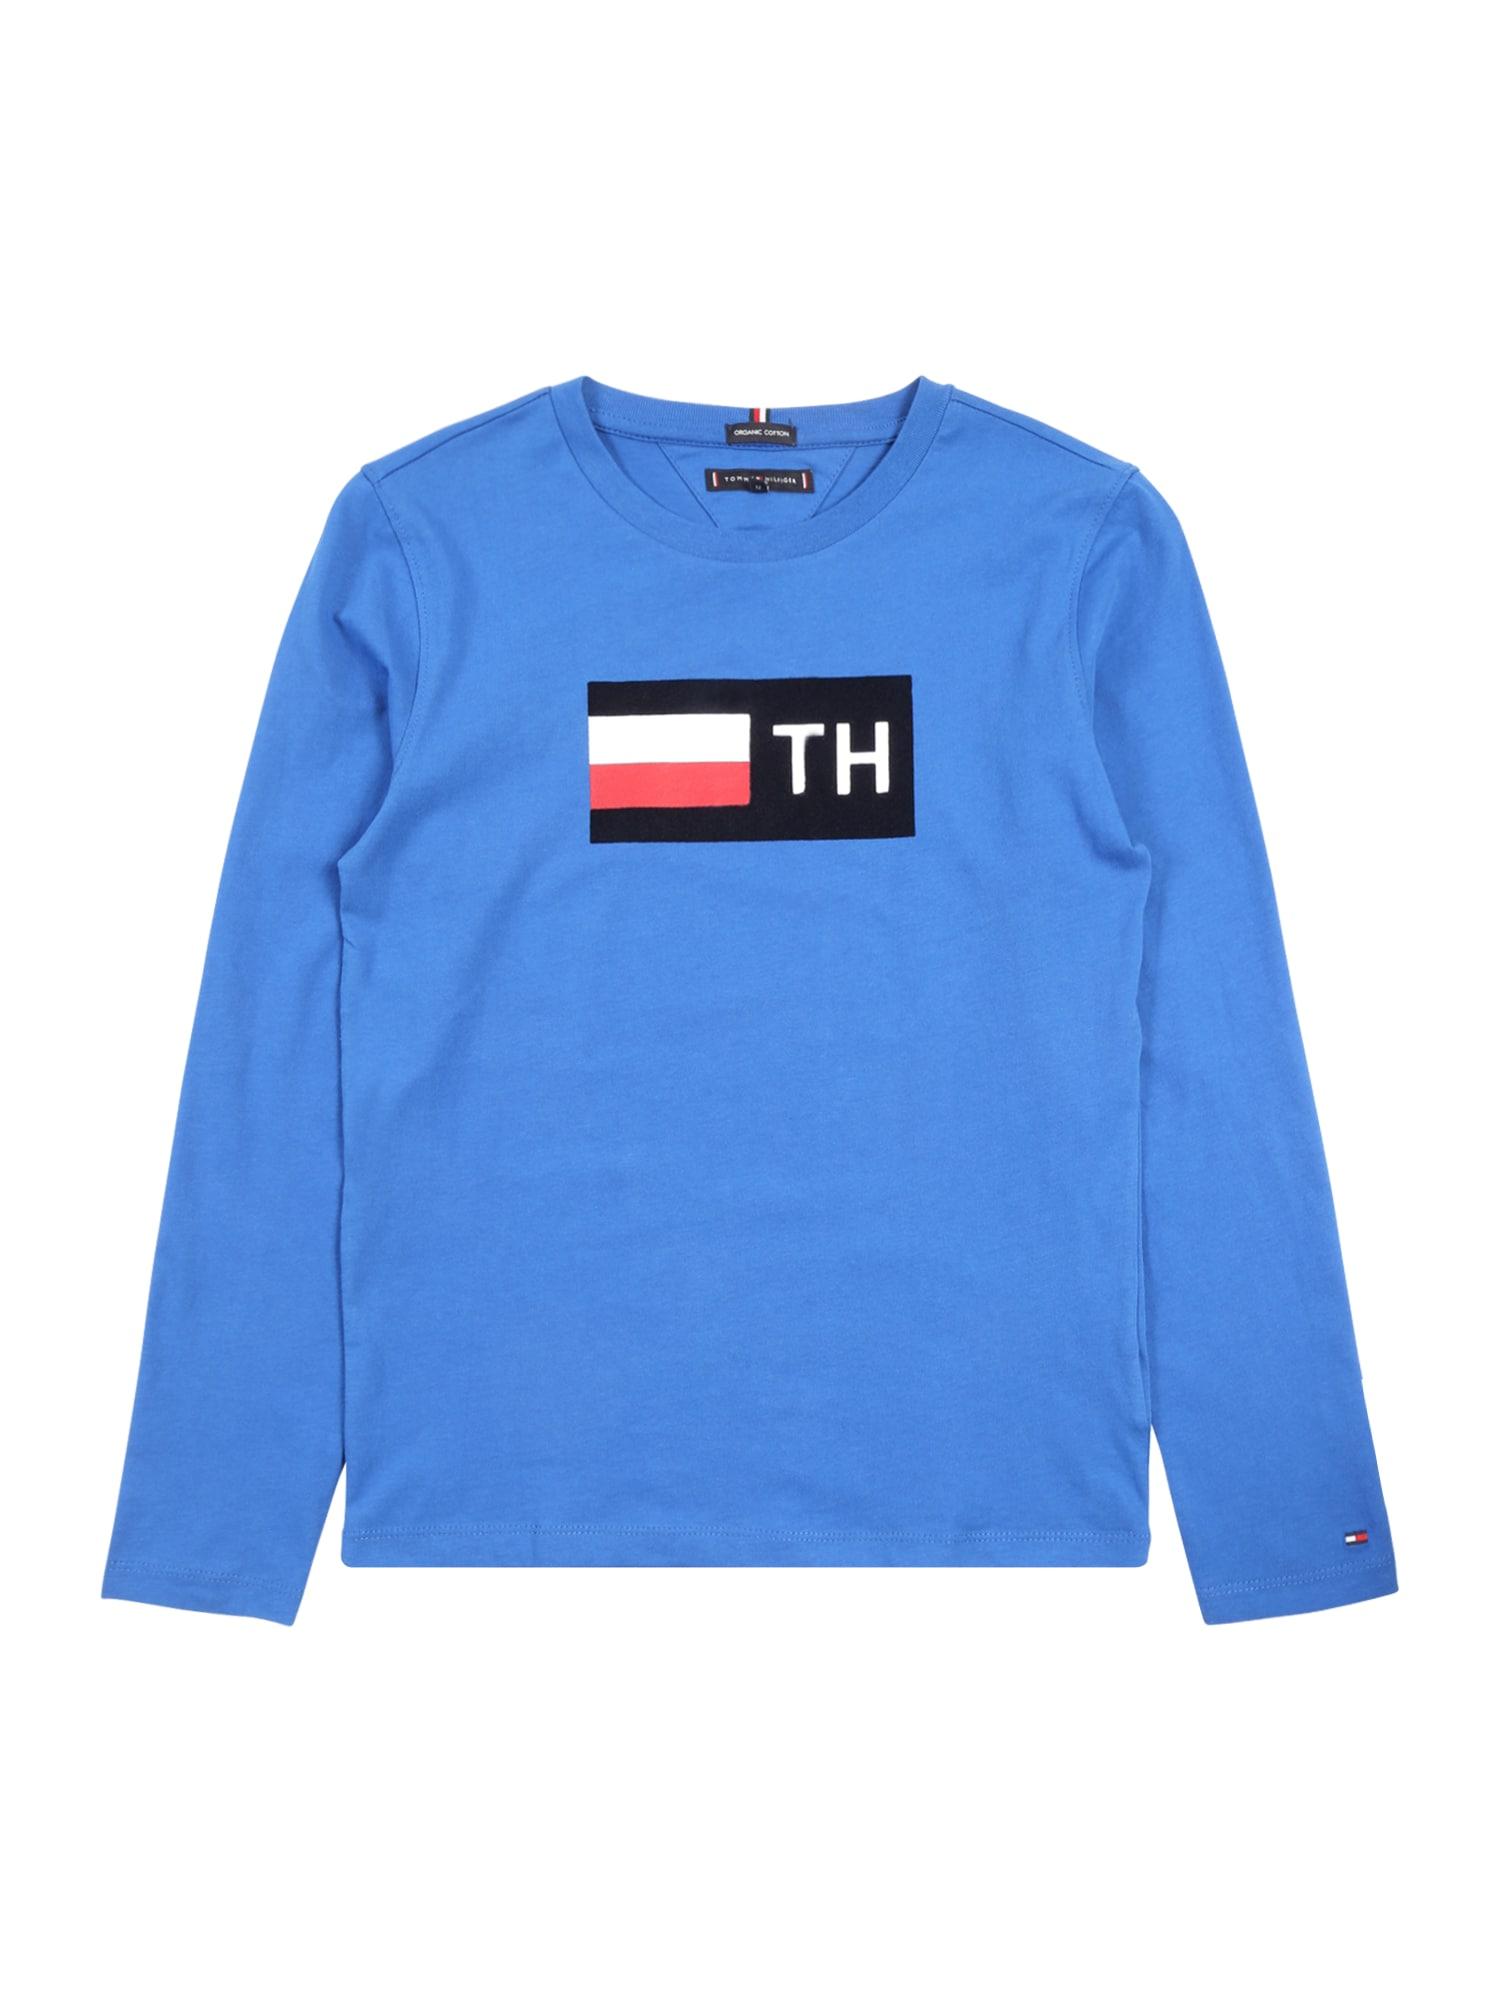 Jungen,  Kinder,  Kinder Tommy Hilfiger Shirt 'TH FLOCK L/S TEE' blau,  rot,  weiß | 08719859054288